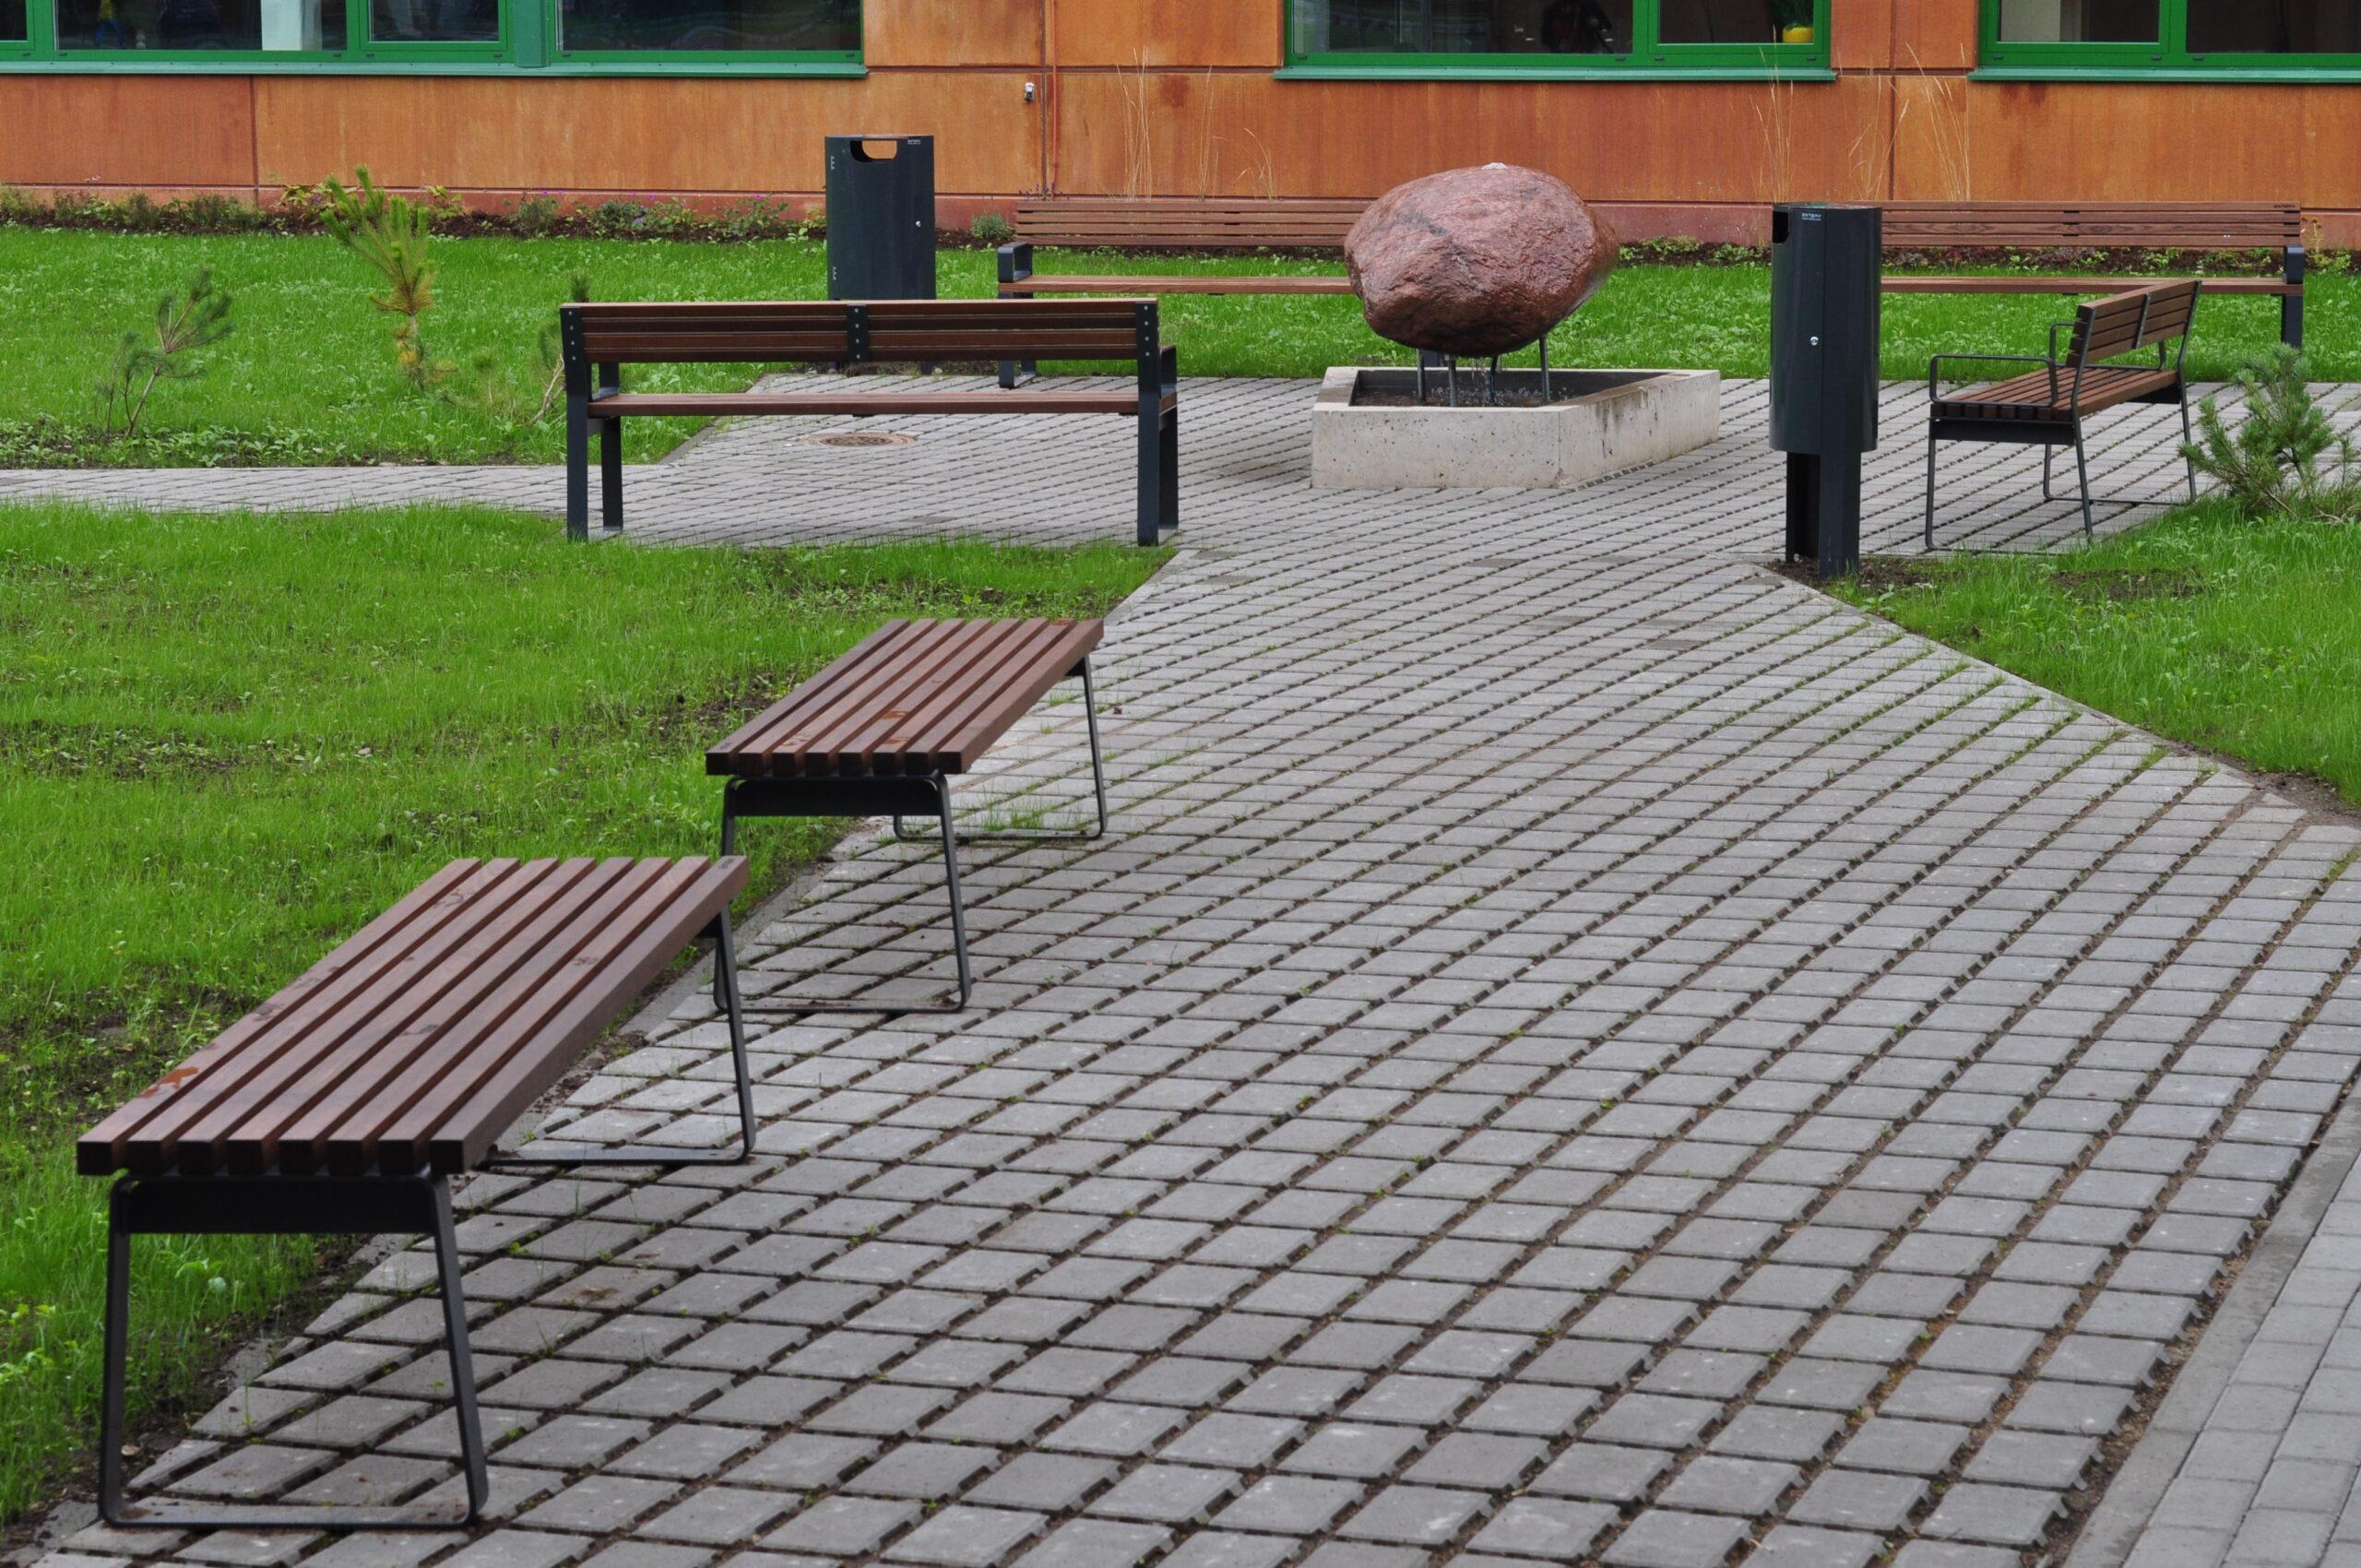 park bench Prima, without backrest